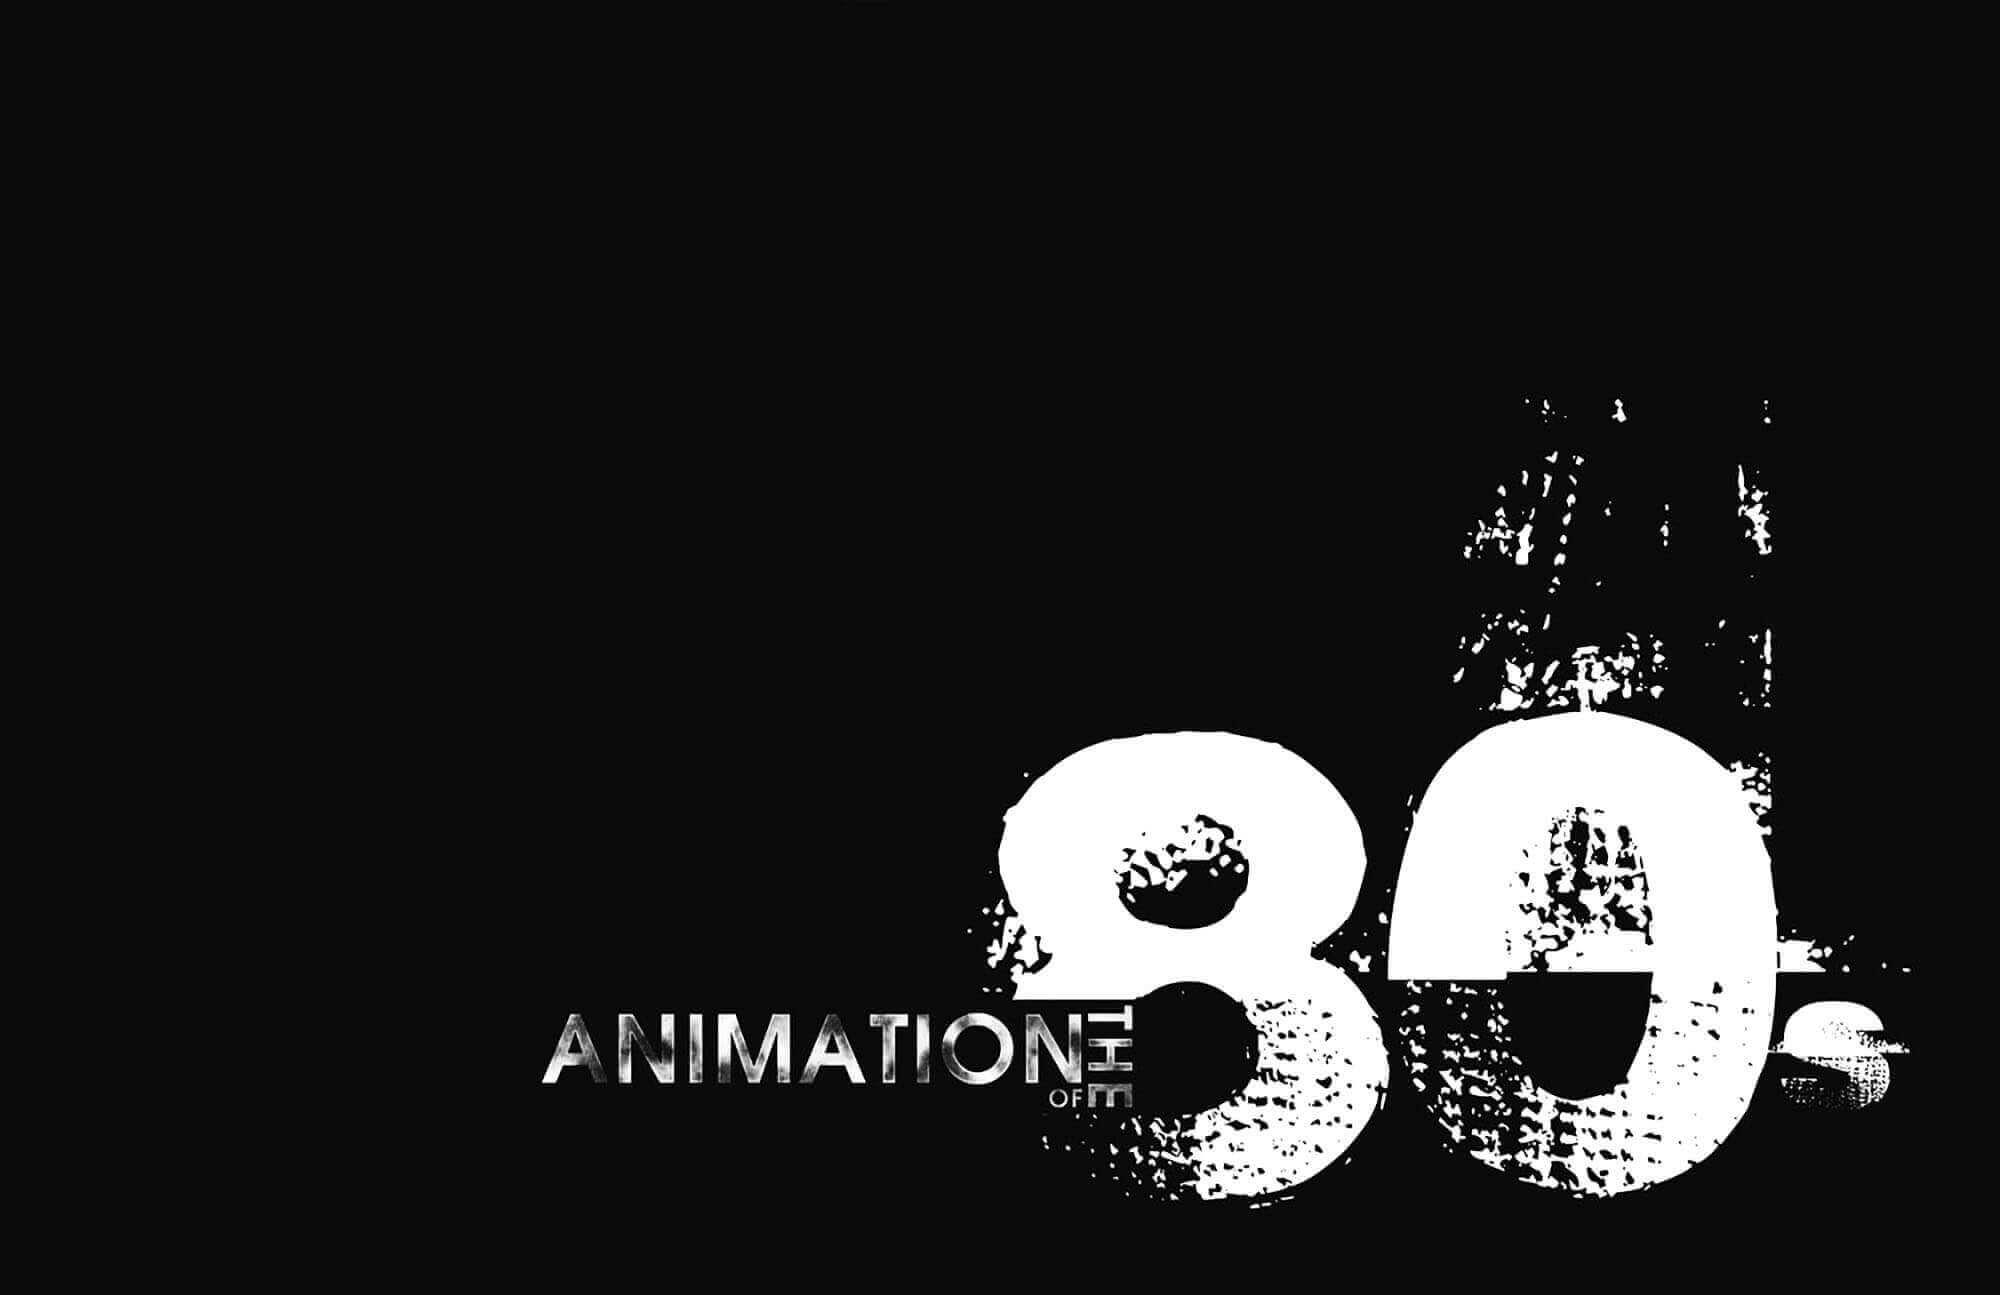 Eighties Animation Exhibition Brand logo